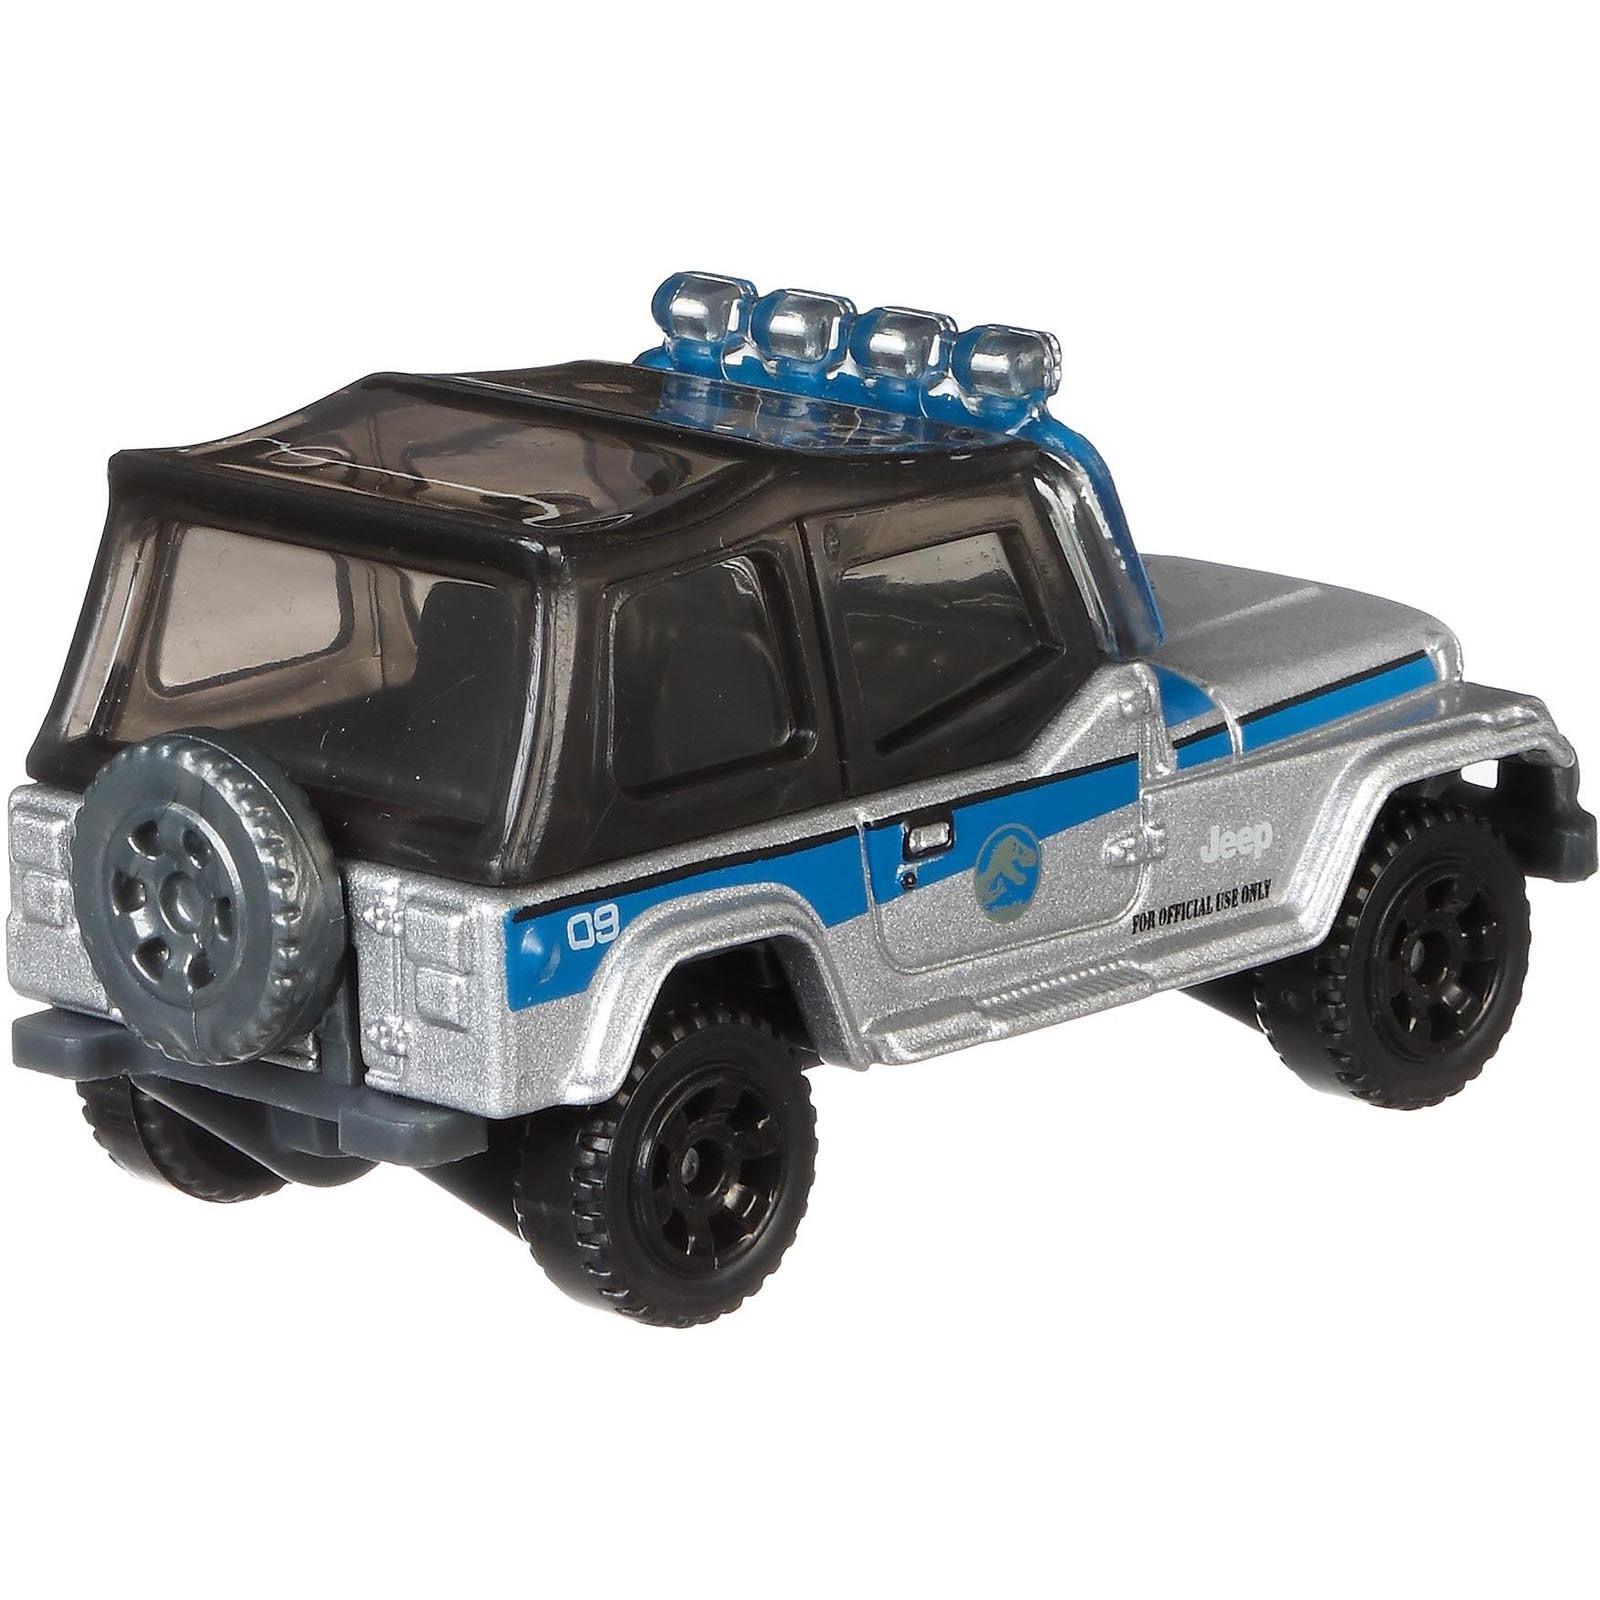 Matchbox - '93 Jeep Wrangler #9 - Jurassic World - FMX10